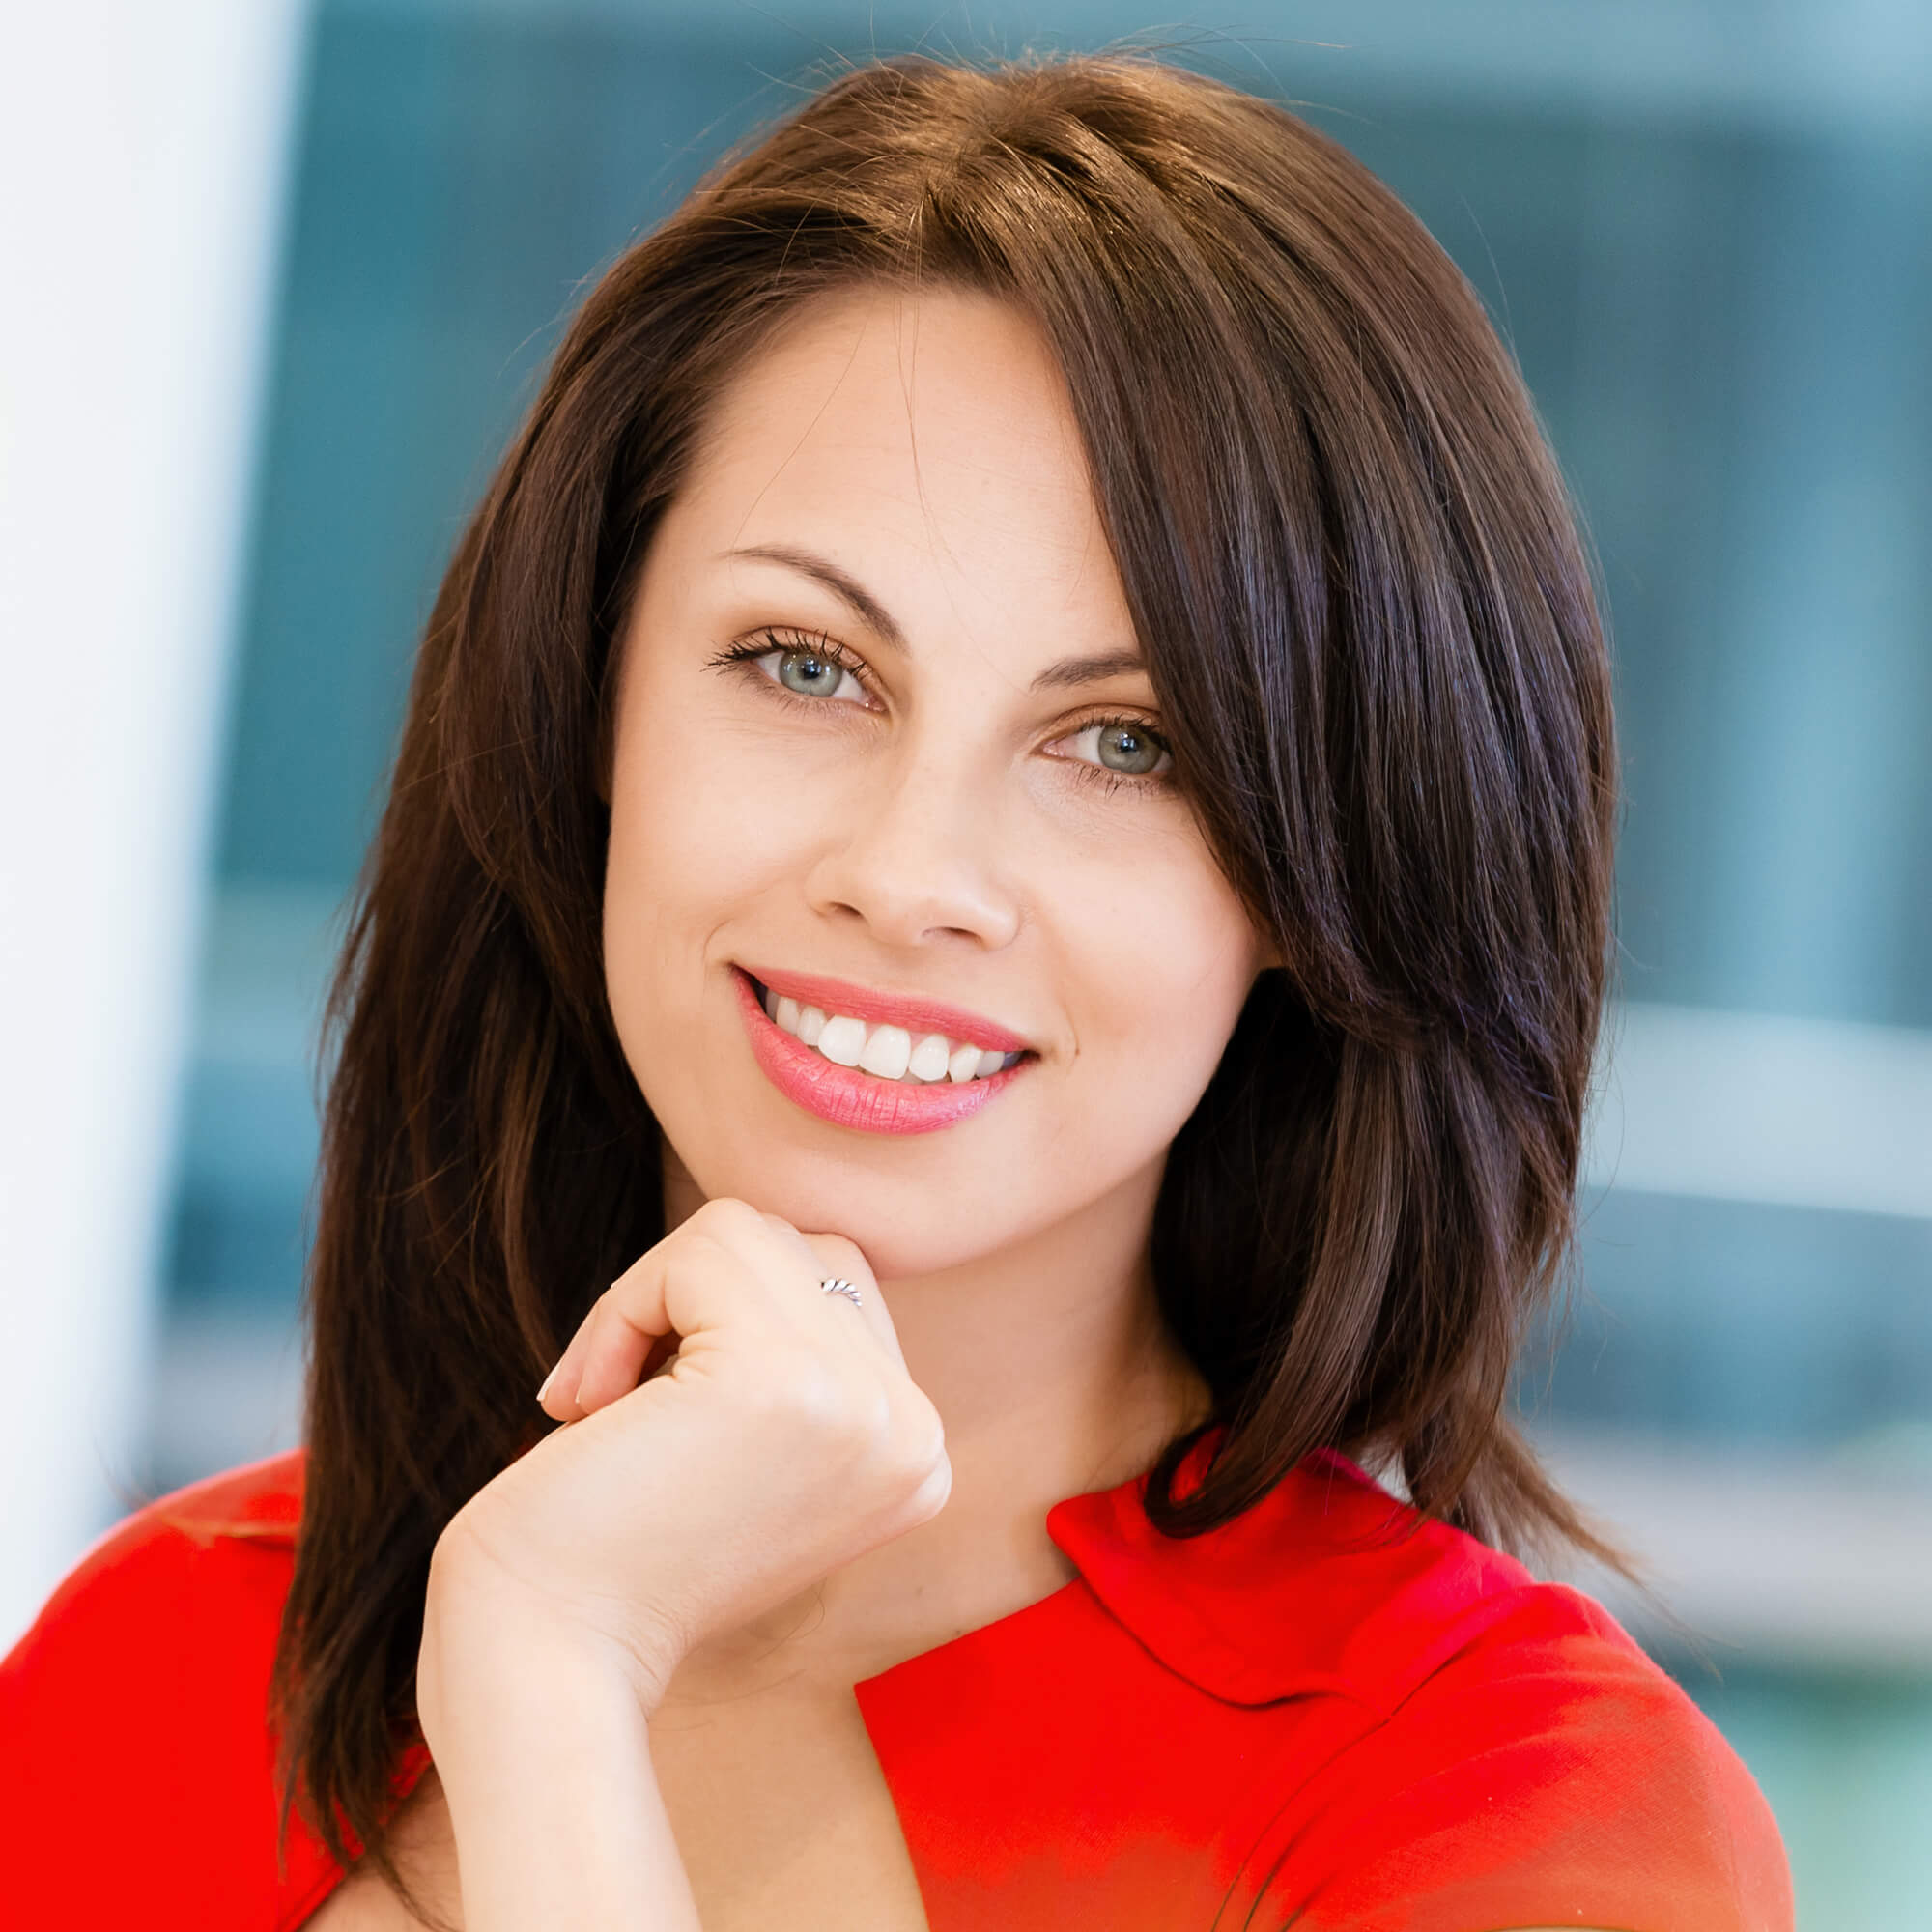 real-estate-exam-tutor-review2